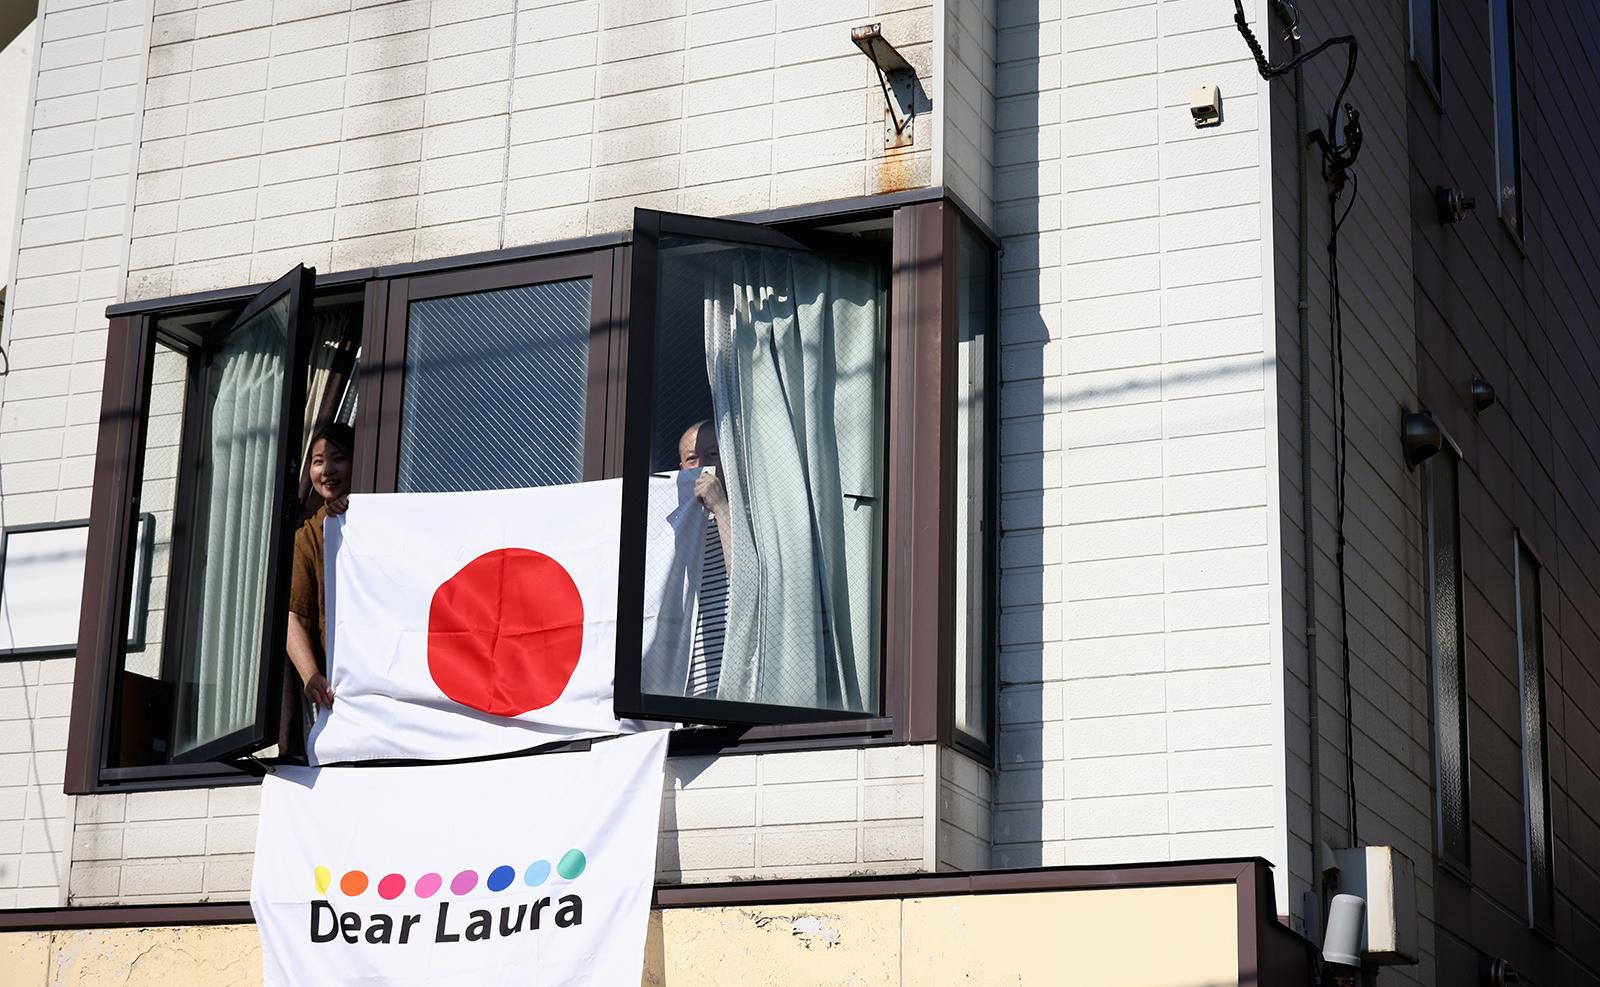 Tokyo 2020 Olympics - Athletics - Women's Marathon - Sapporo Odori Park, Sapporo, Japan - August 7, 2021. Supporters hold a Japanese flag. REUTERS